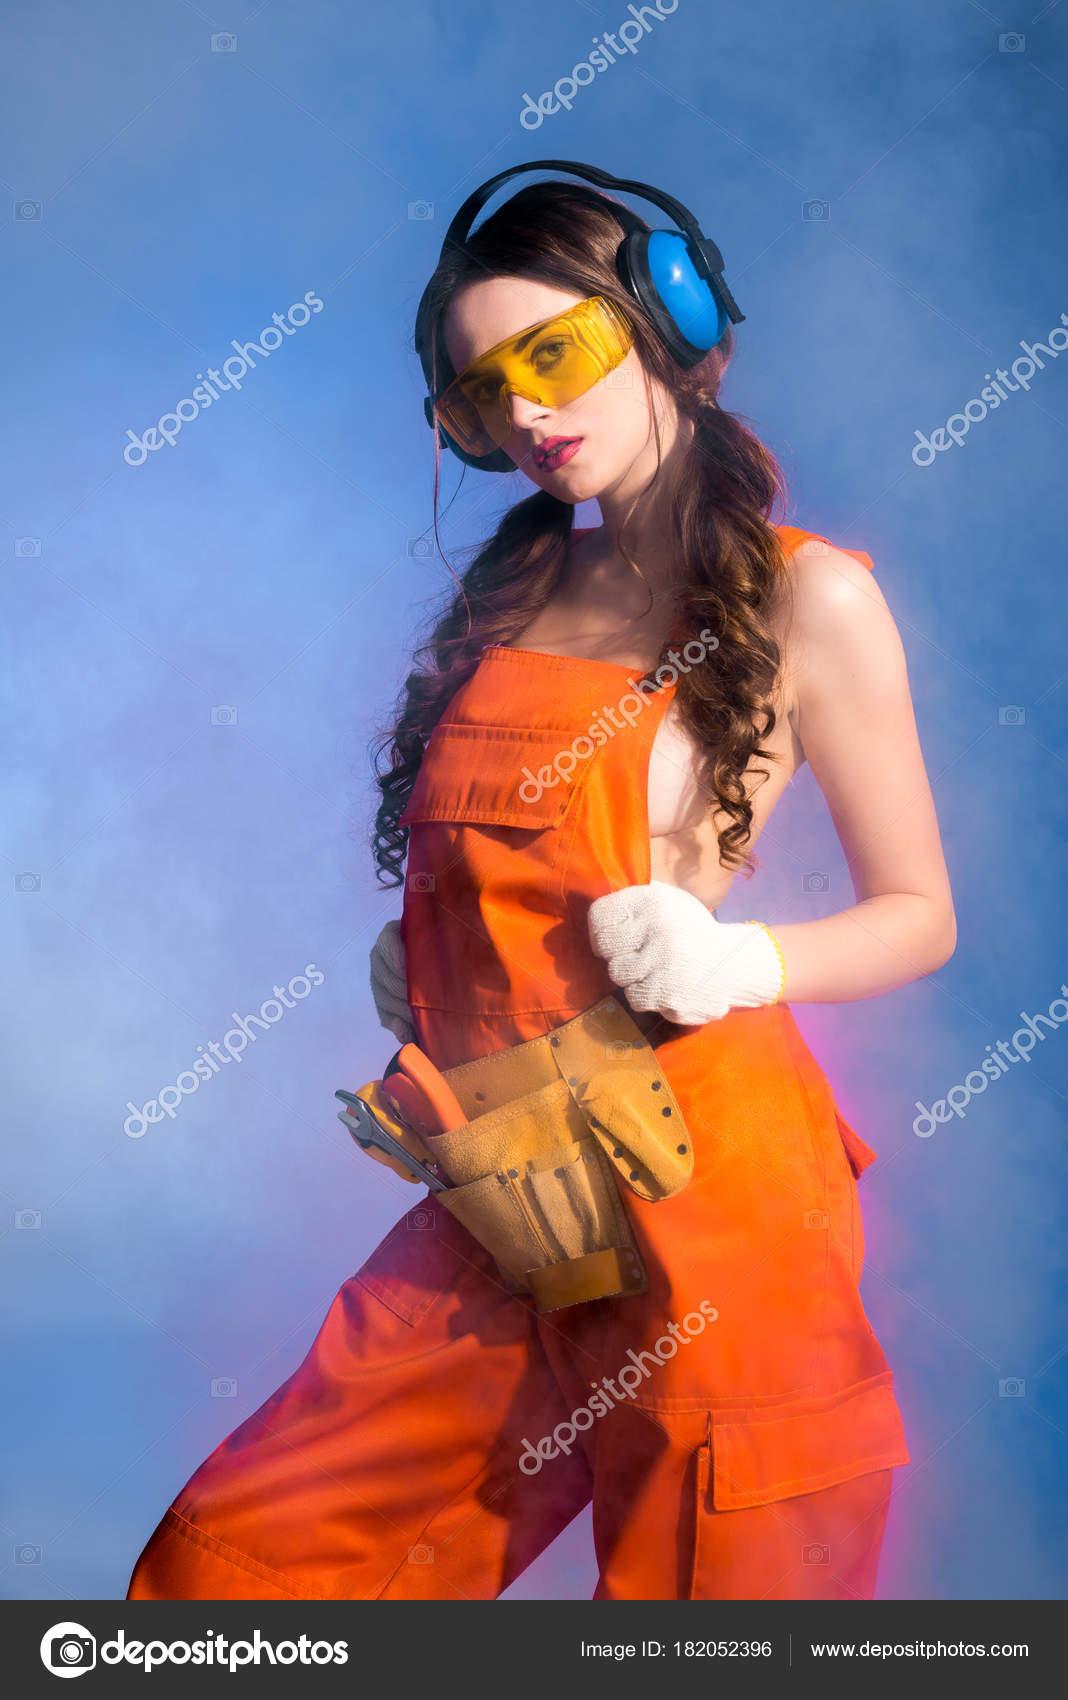 beautiful sexy girl overalls tool belt goggles protective headphones